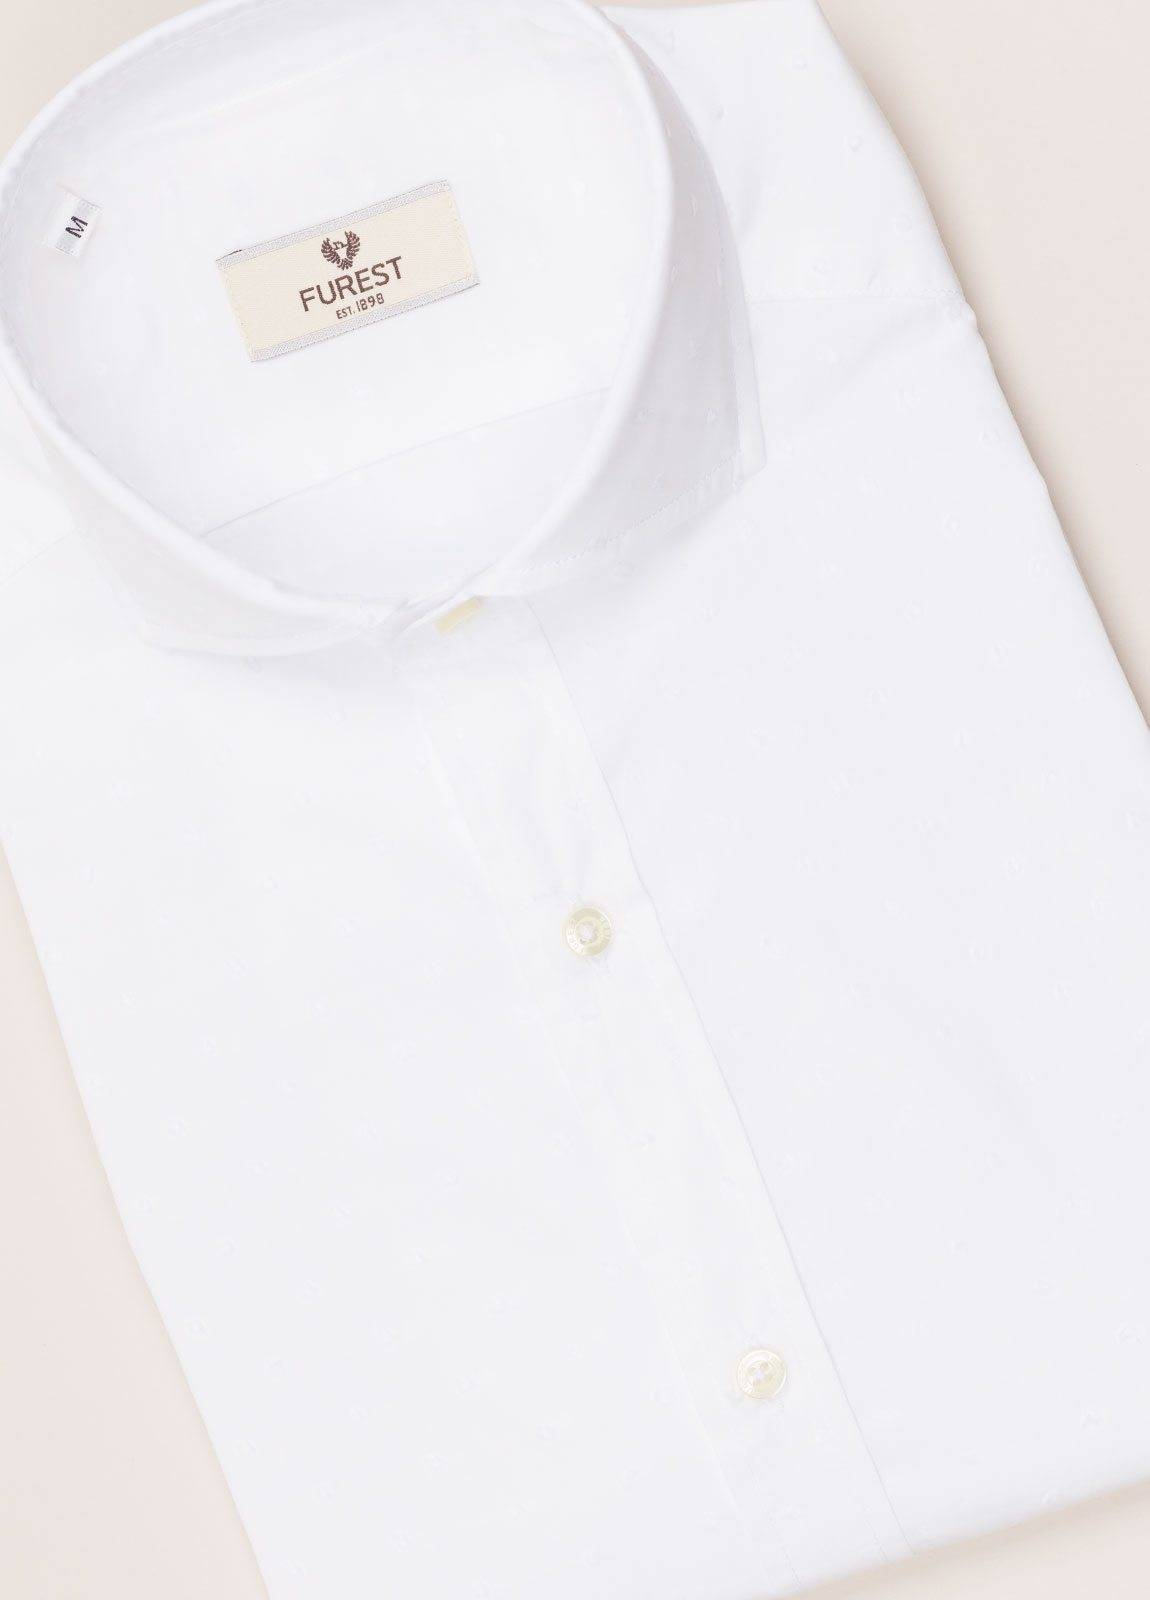 Camisa sport FUREST COLECCIÓN SLIM FIT fil coupé blanco - Ítem2